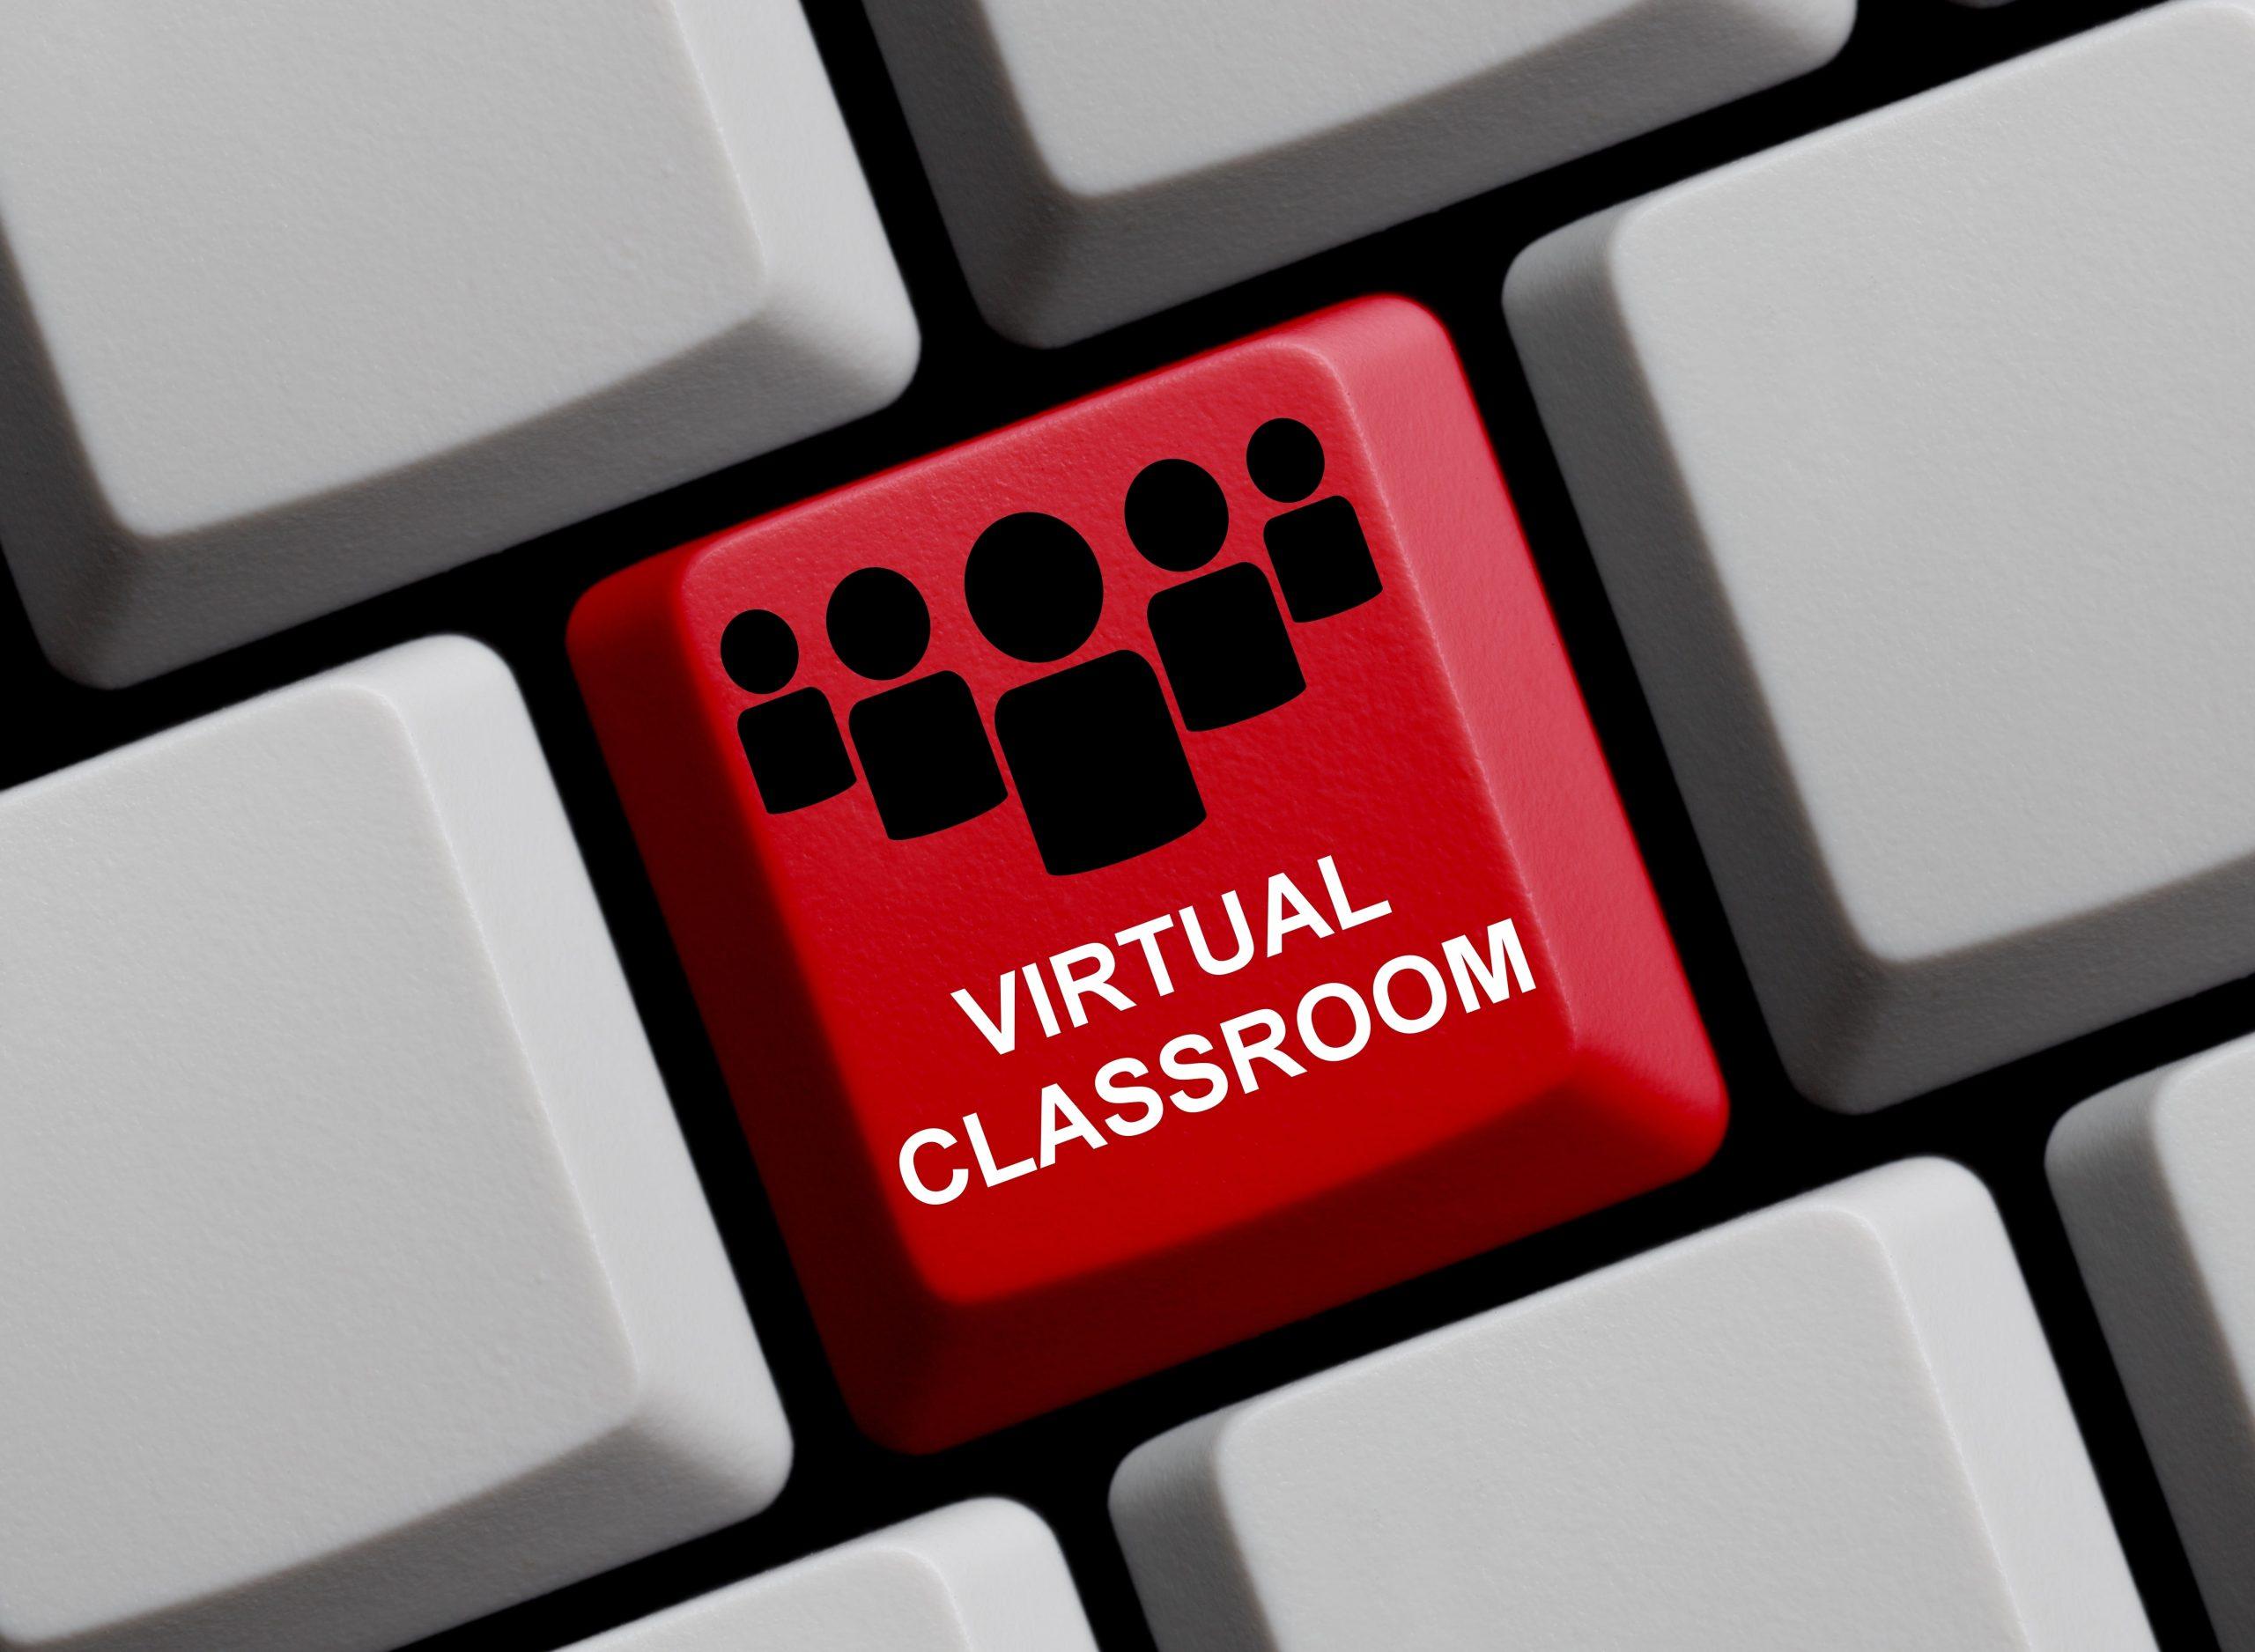 COVID-19 Update: Virtual Classroom Training Courses